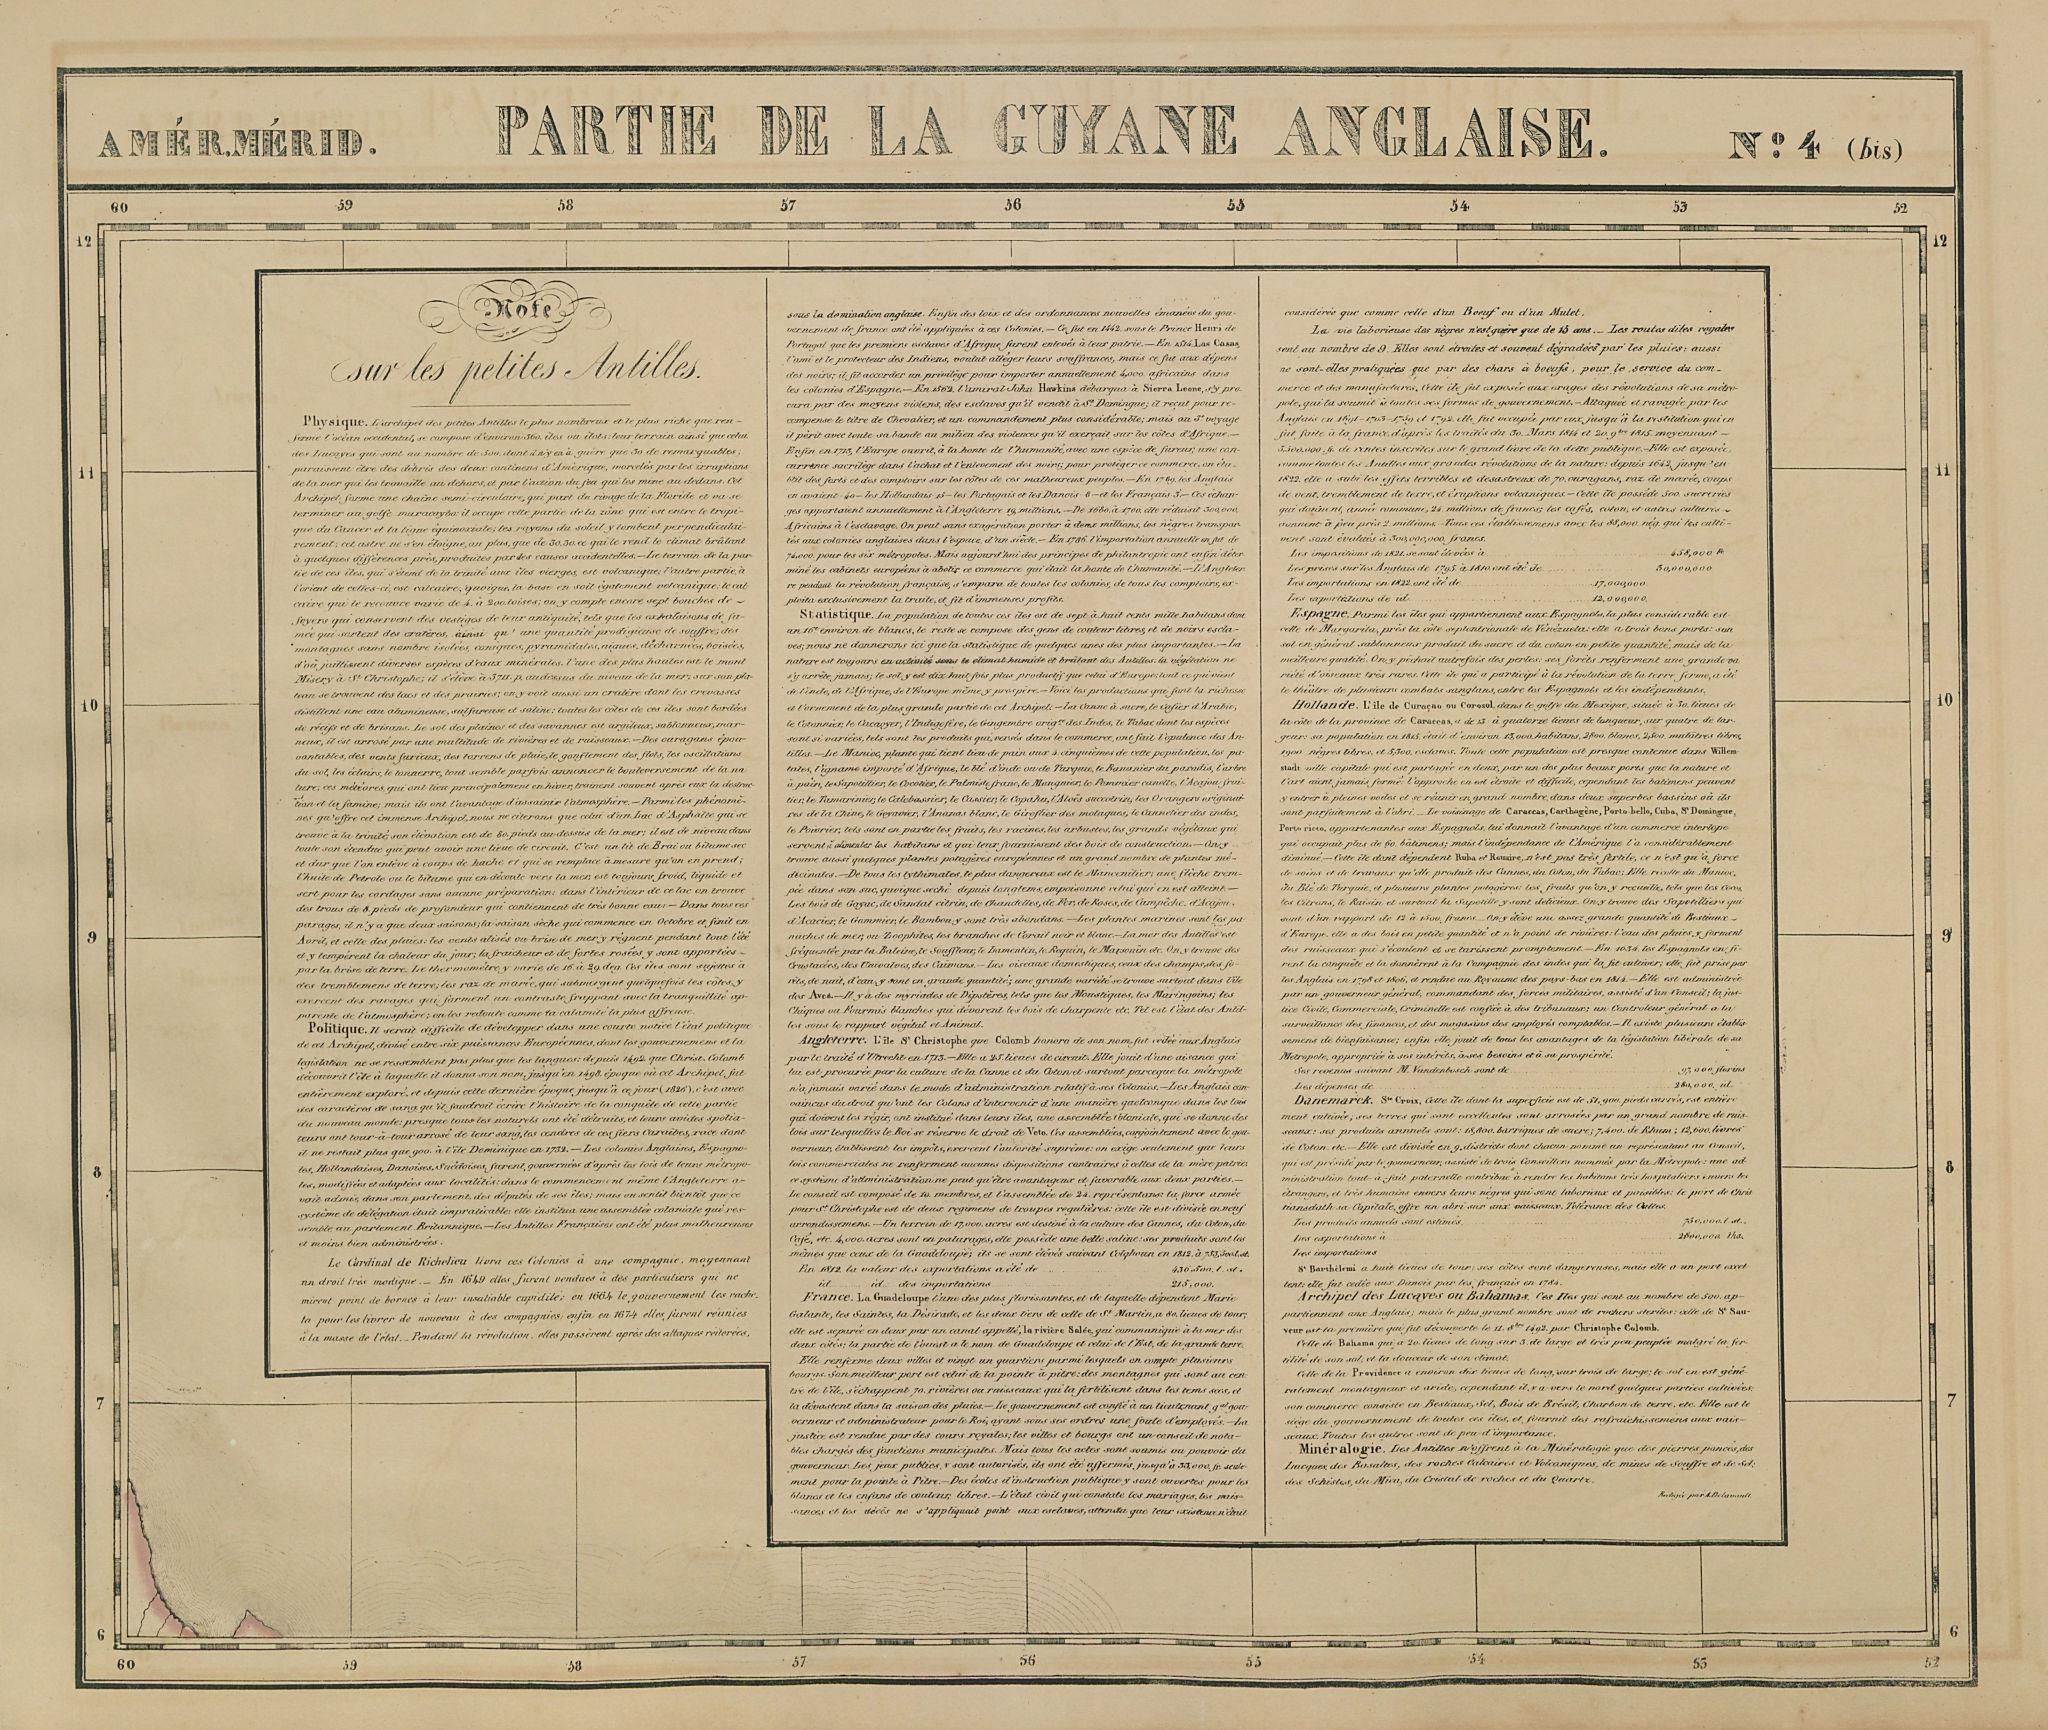 Amér. Mér. Guyane Anglaise #4 bis. Guyana Suriname. VANDERMAELEN 1827 old map